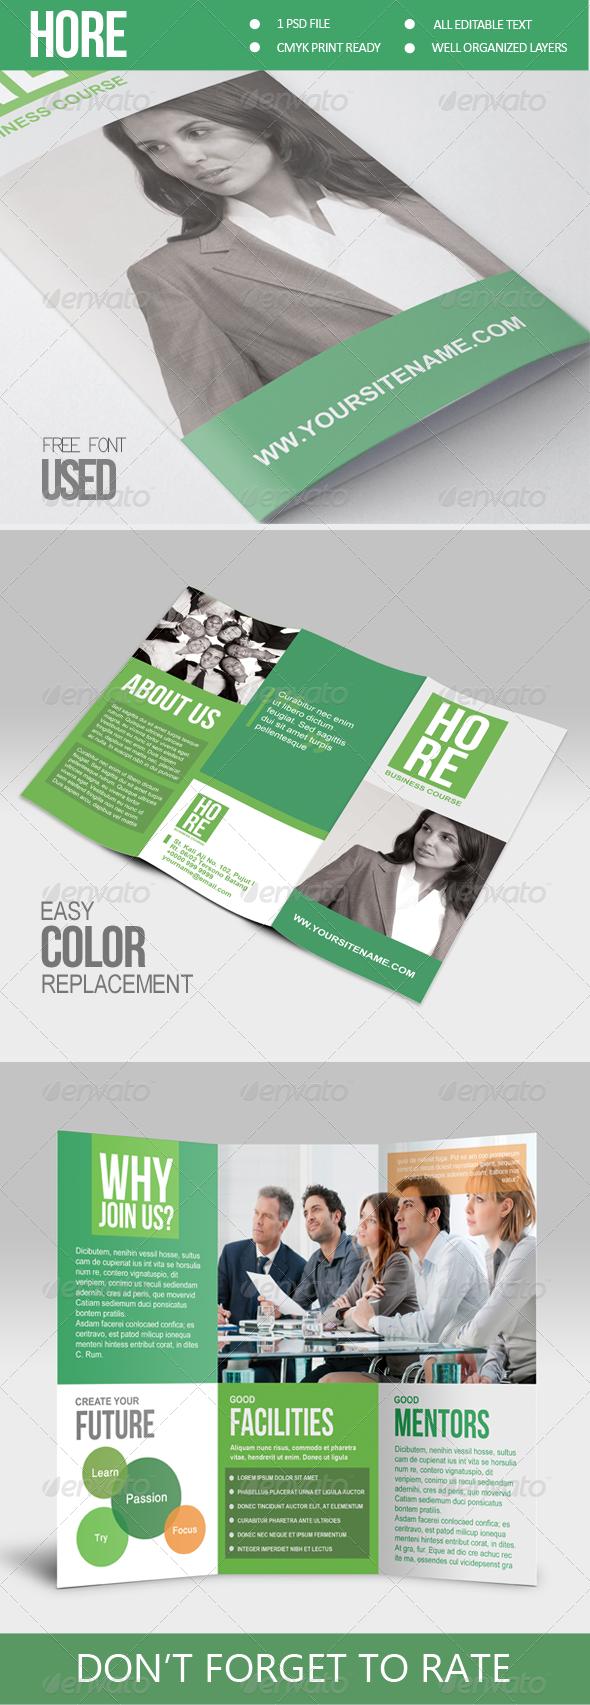 Hore - Multipurpose Trifold Brochure - Corporate Brochures